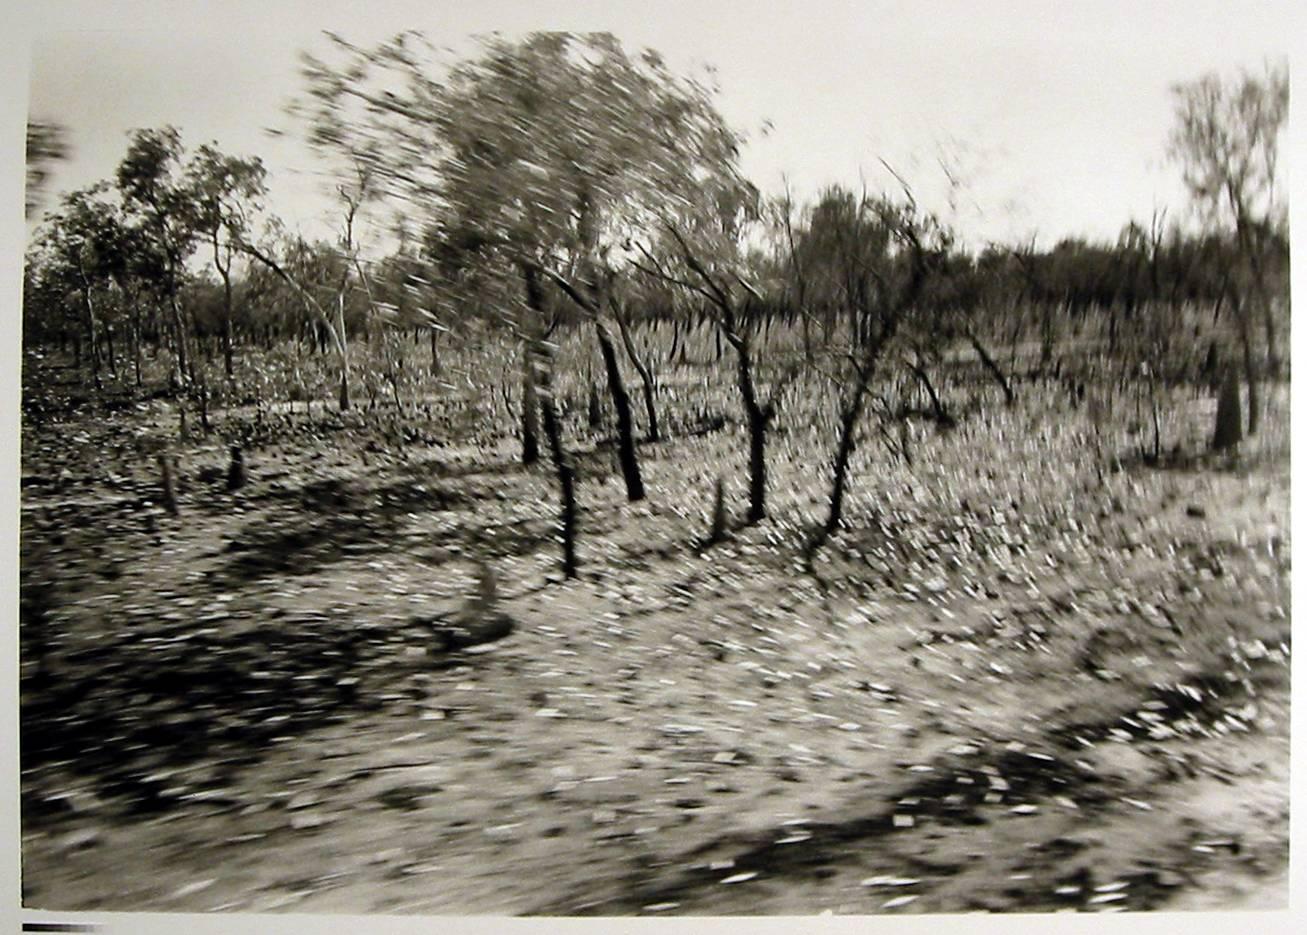 Susan Purdy, Diagonal Landscape, 1993, Silver Gelatin Photograph, 62 x 92cm. Latrobe Regional Gallery Collection.